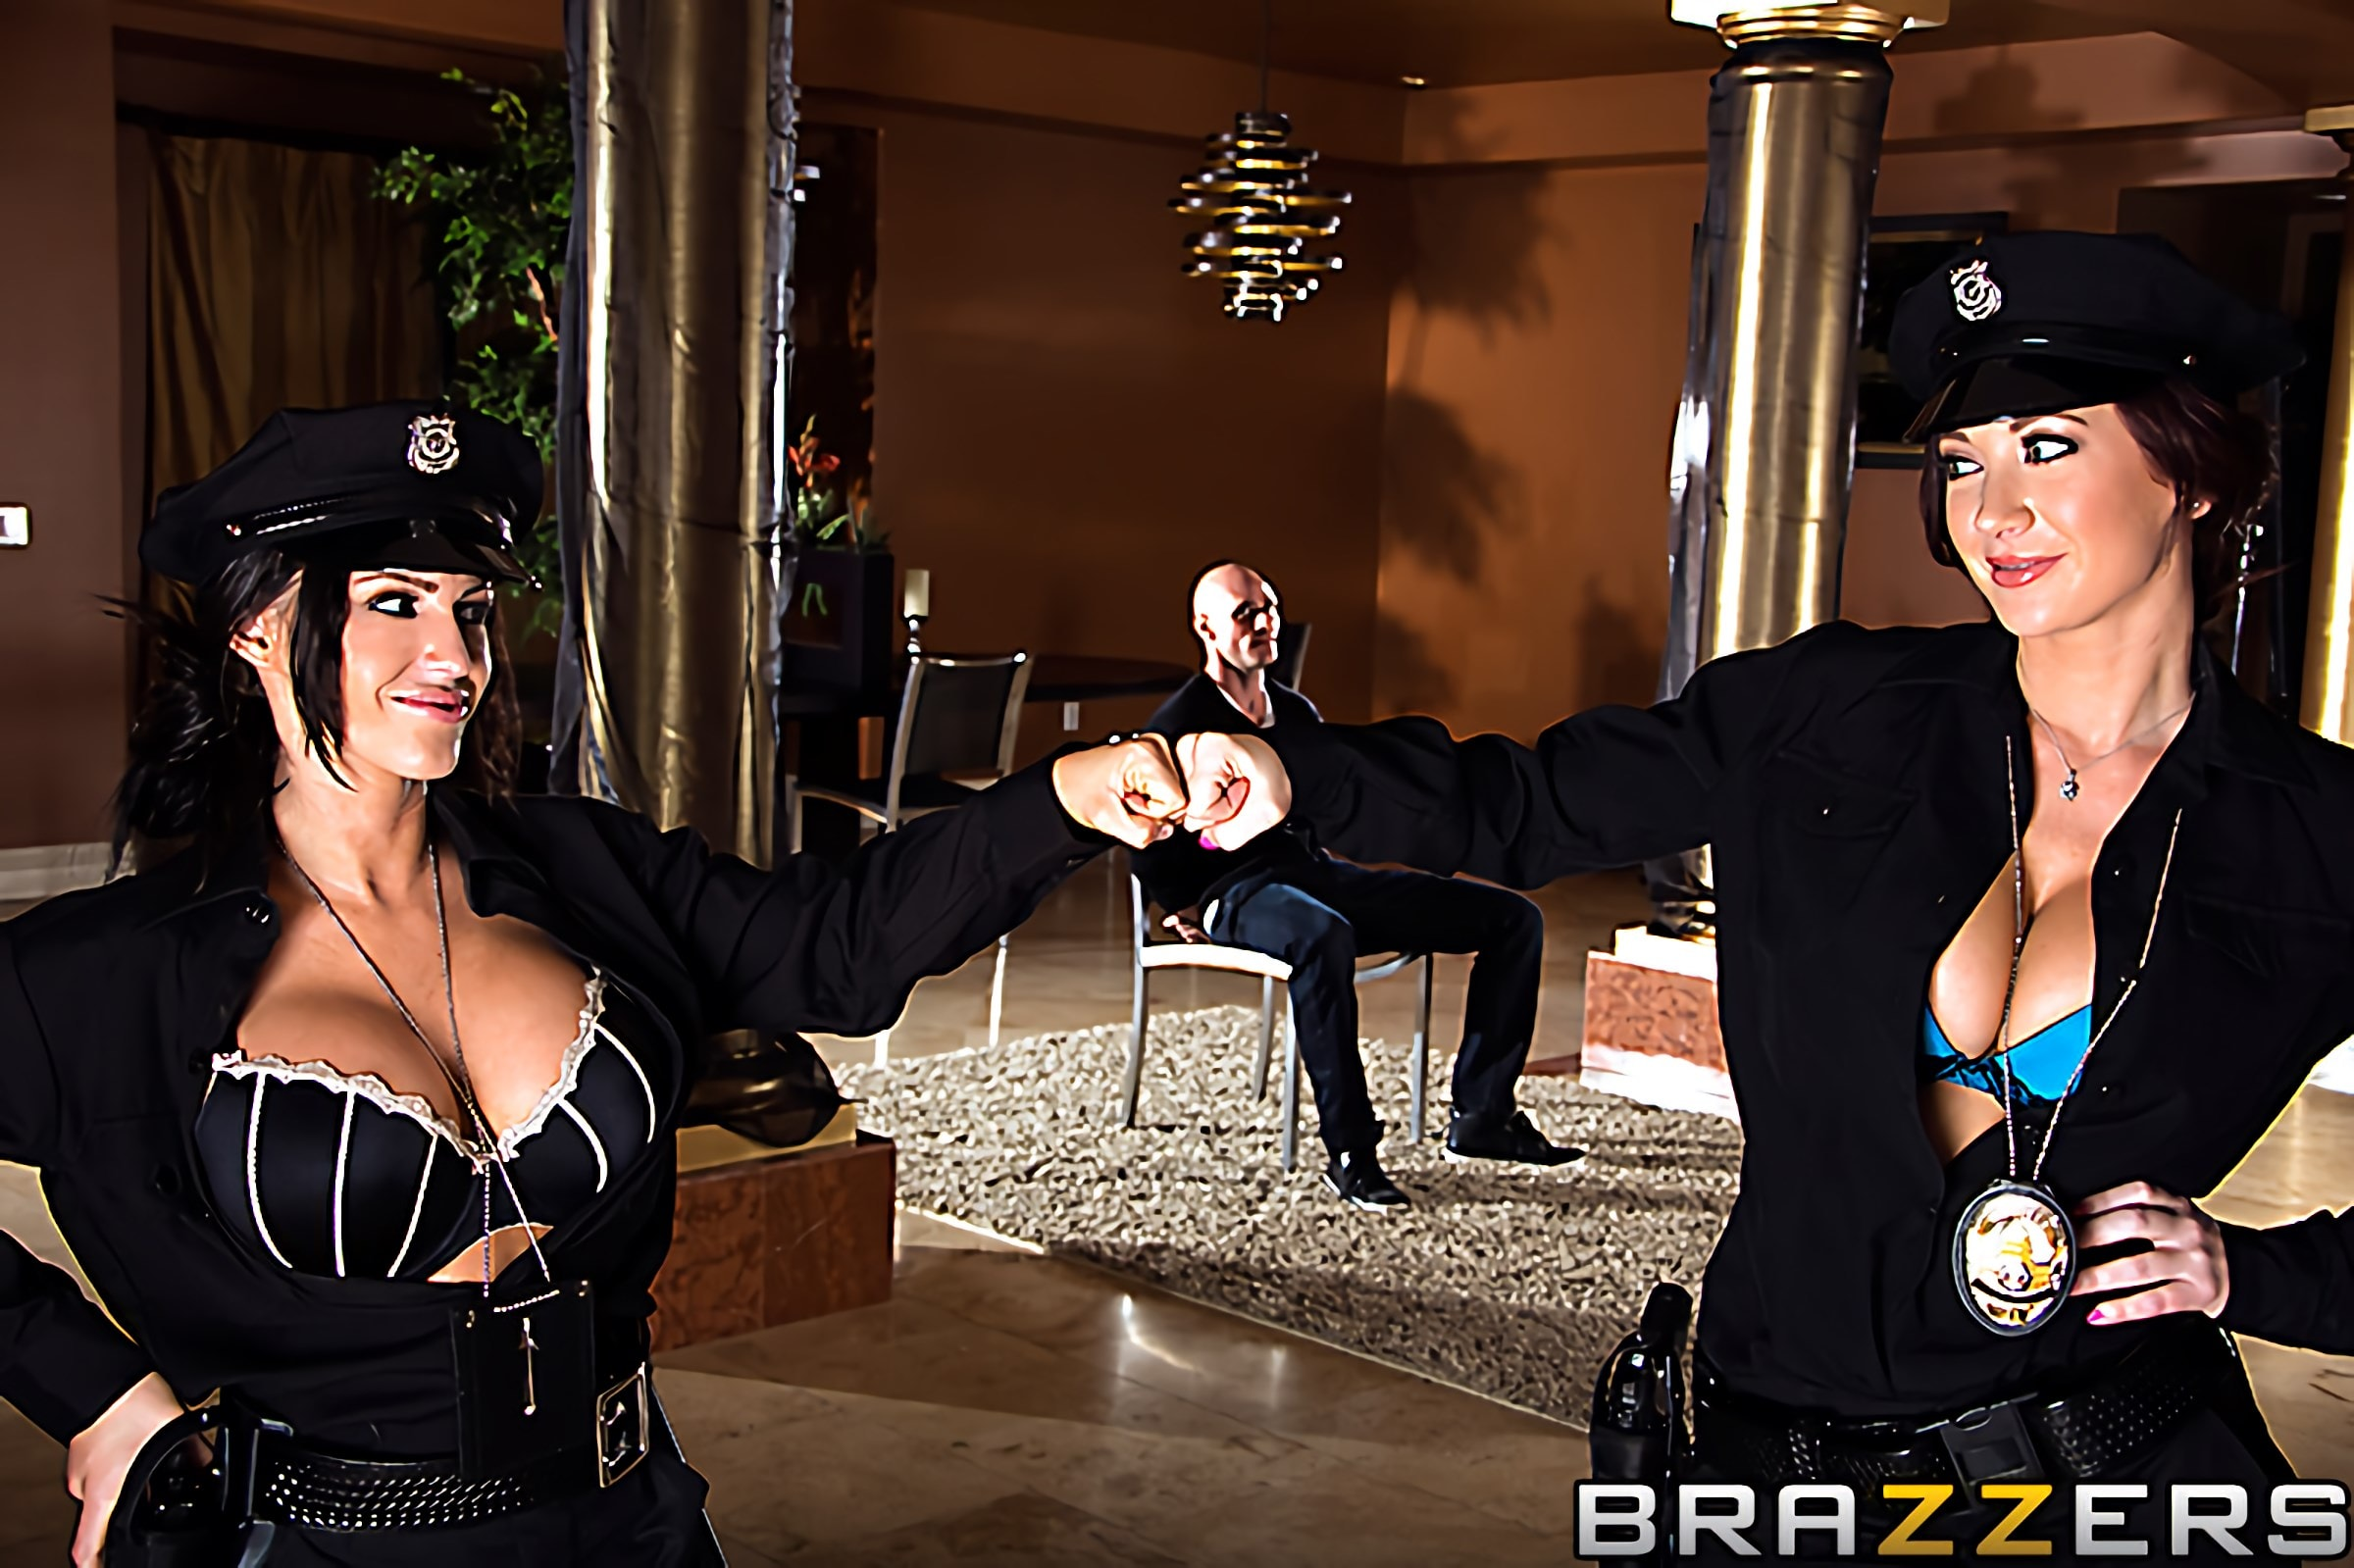 Brazzers 'Enhanced Interrogation' starring Jayden Jaymes (Photo 2)